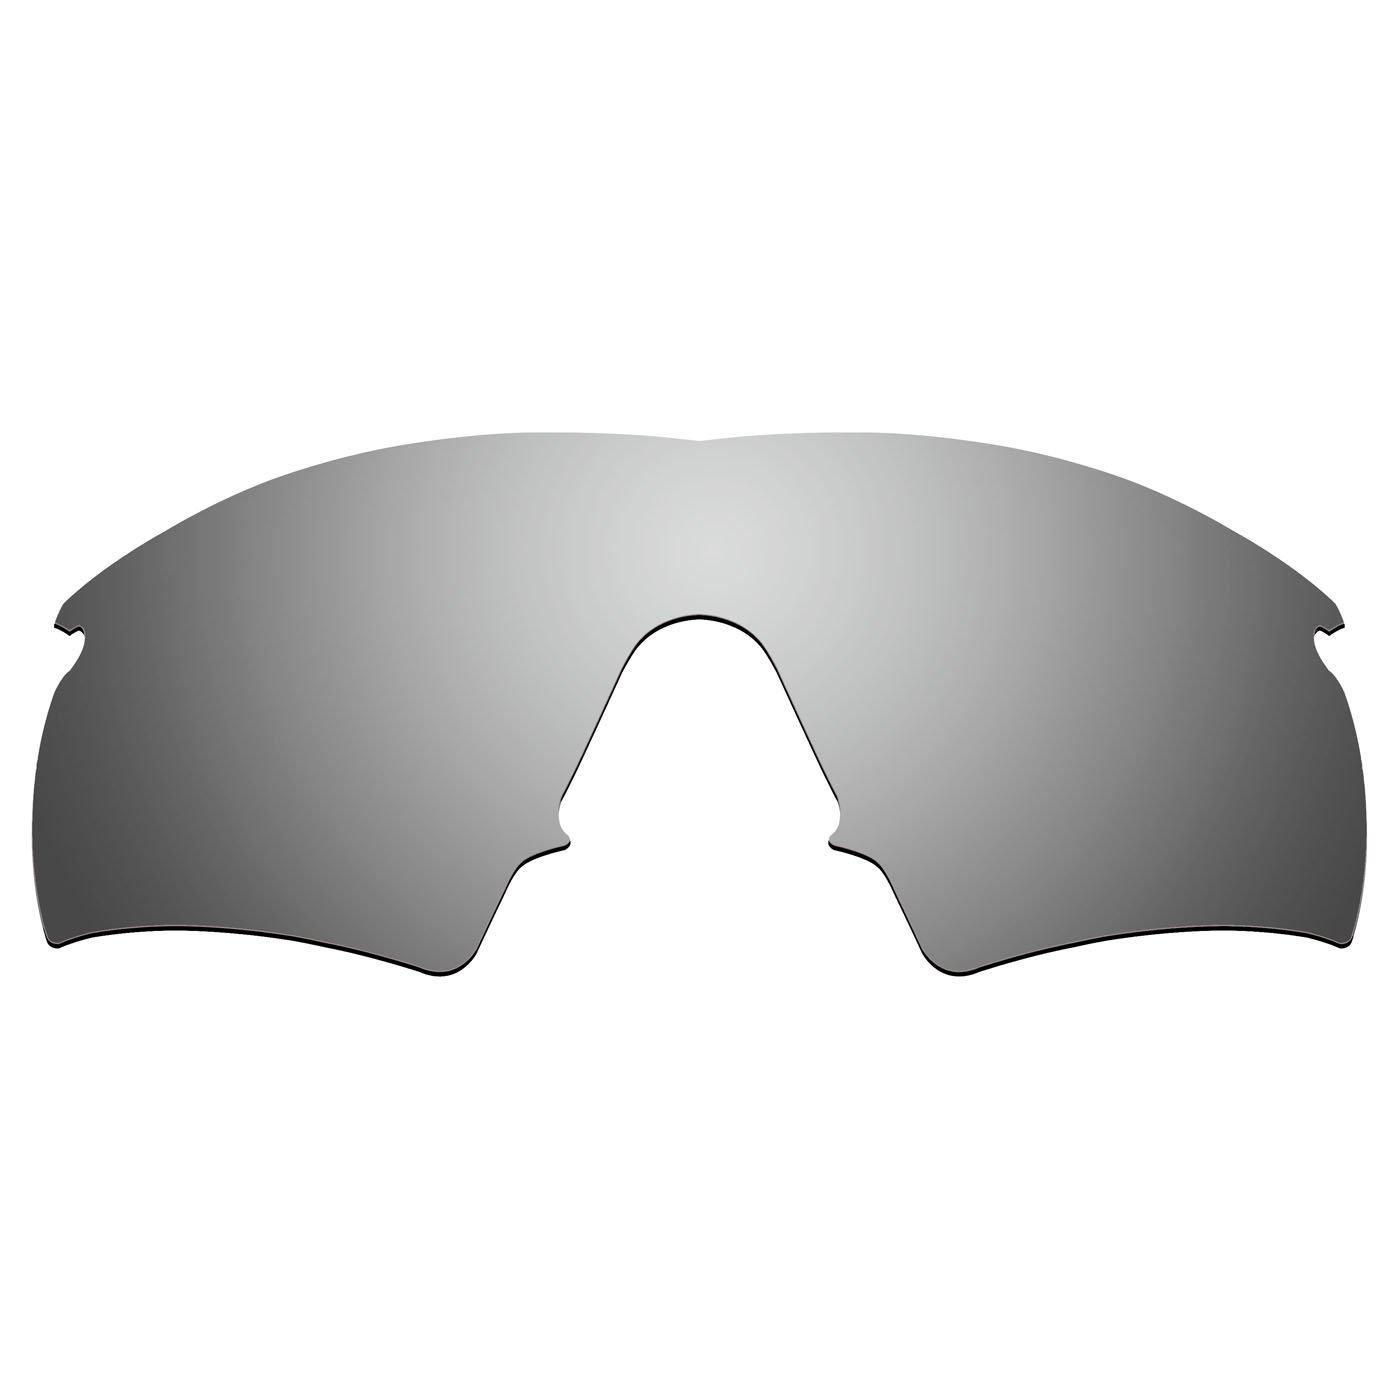 8fa8499ffa ACOMPATIBLE Replacement Lenses for Oakley M Frame Hybrid New (1999 Year)  Sunglasses (Titanium Mirror - Polarized)  Amazon.co.uk  Sports   Outdoors